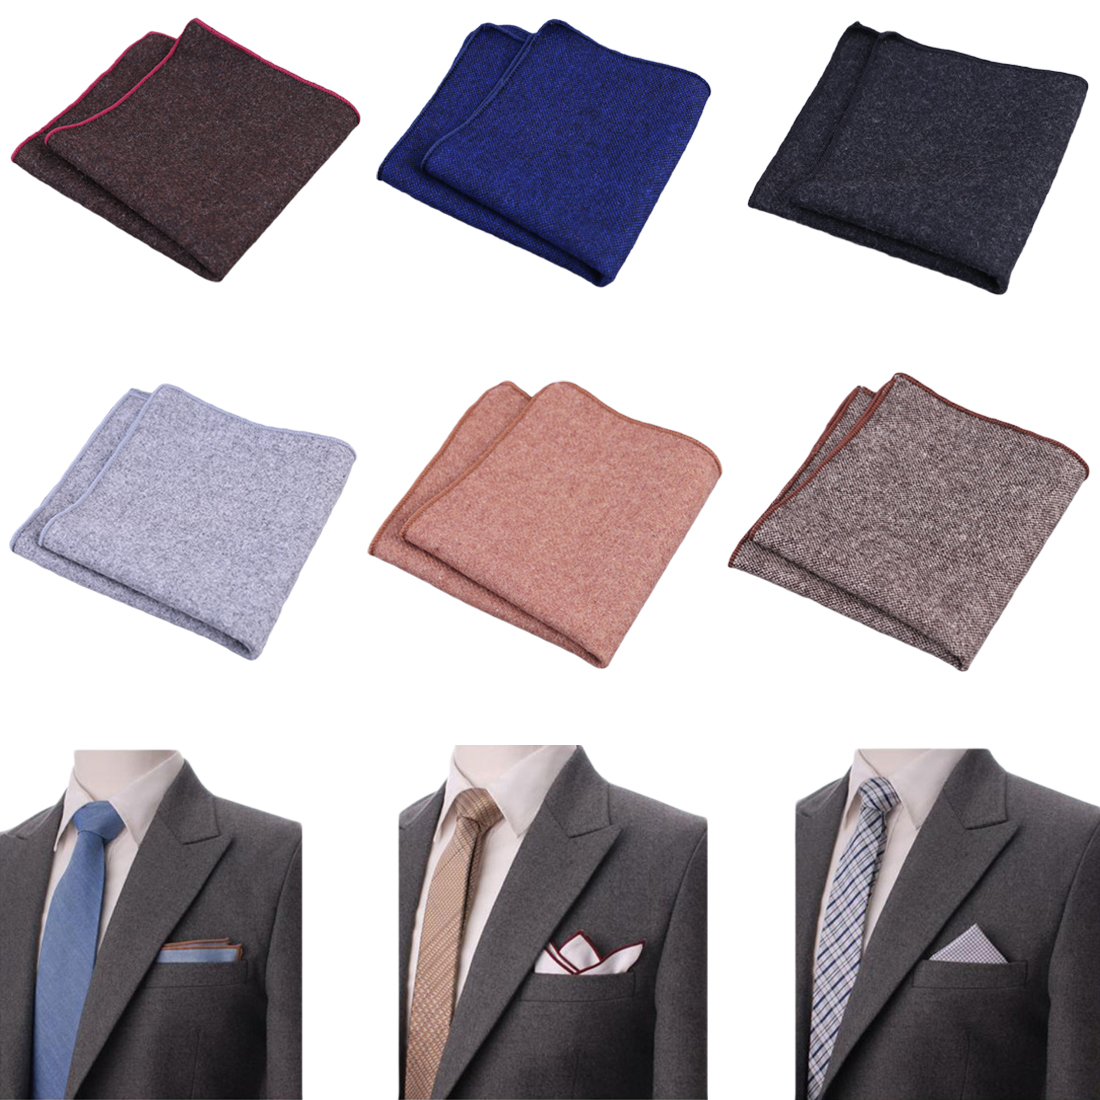 23*23cm High Quality Hankerchief Vintage Suits Solid Pocket Wool Hankies Men's Pocket Square Handkerchiefs Striped Solid Cotton